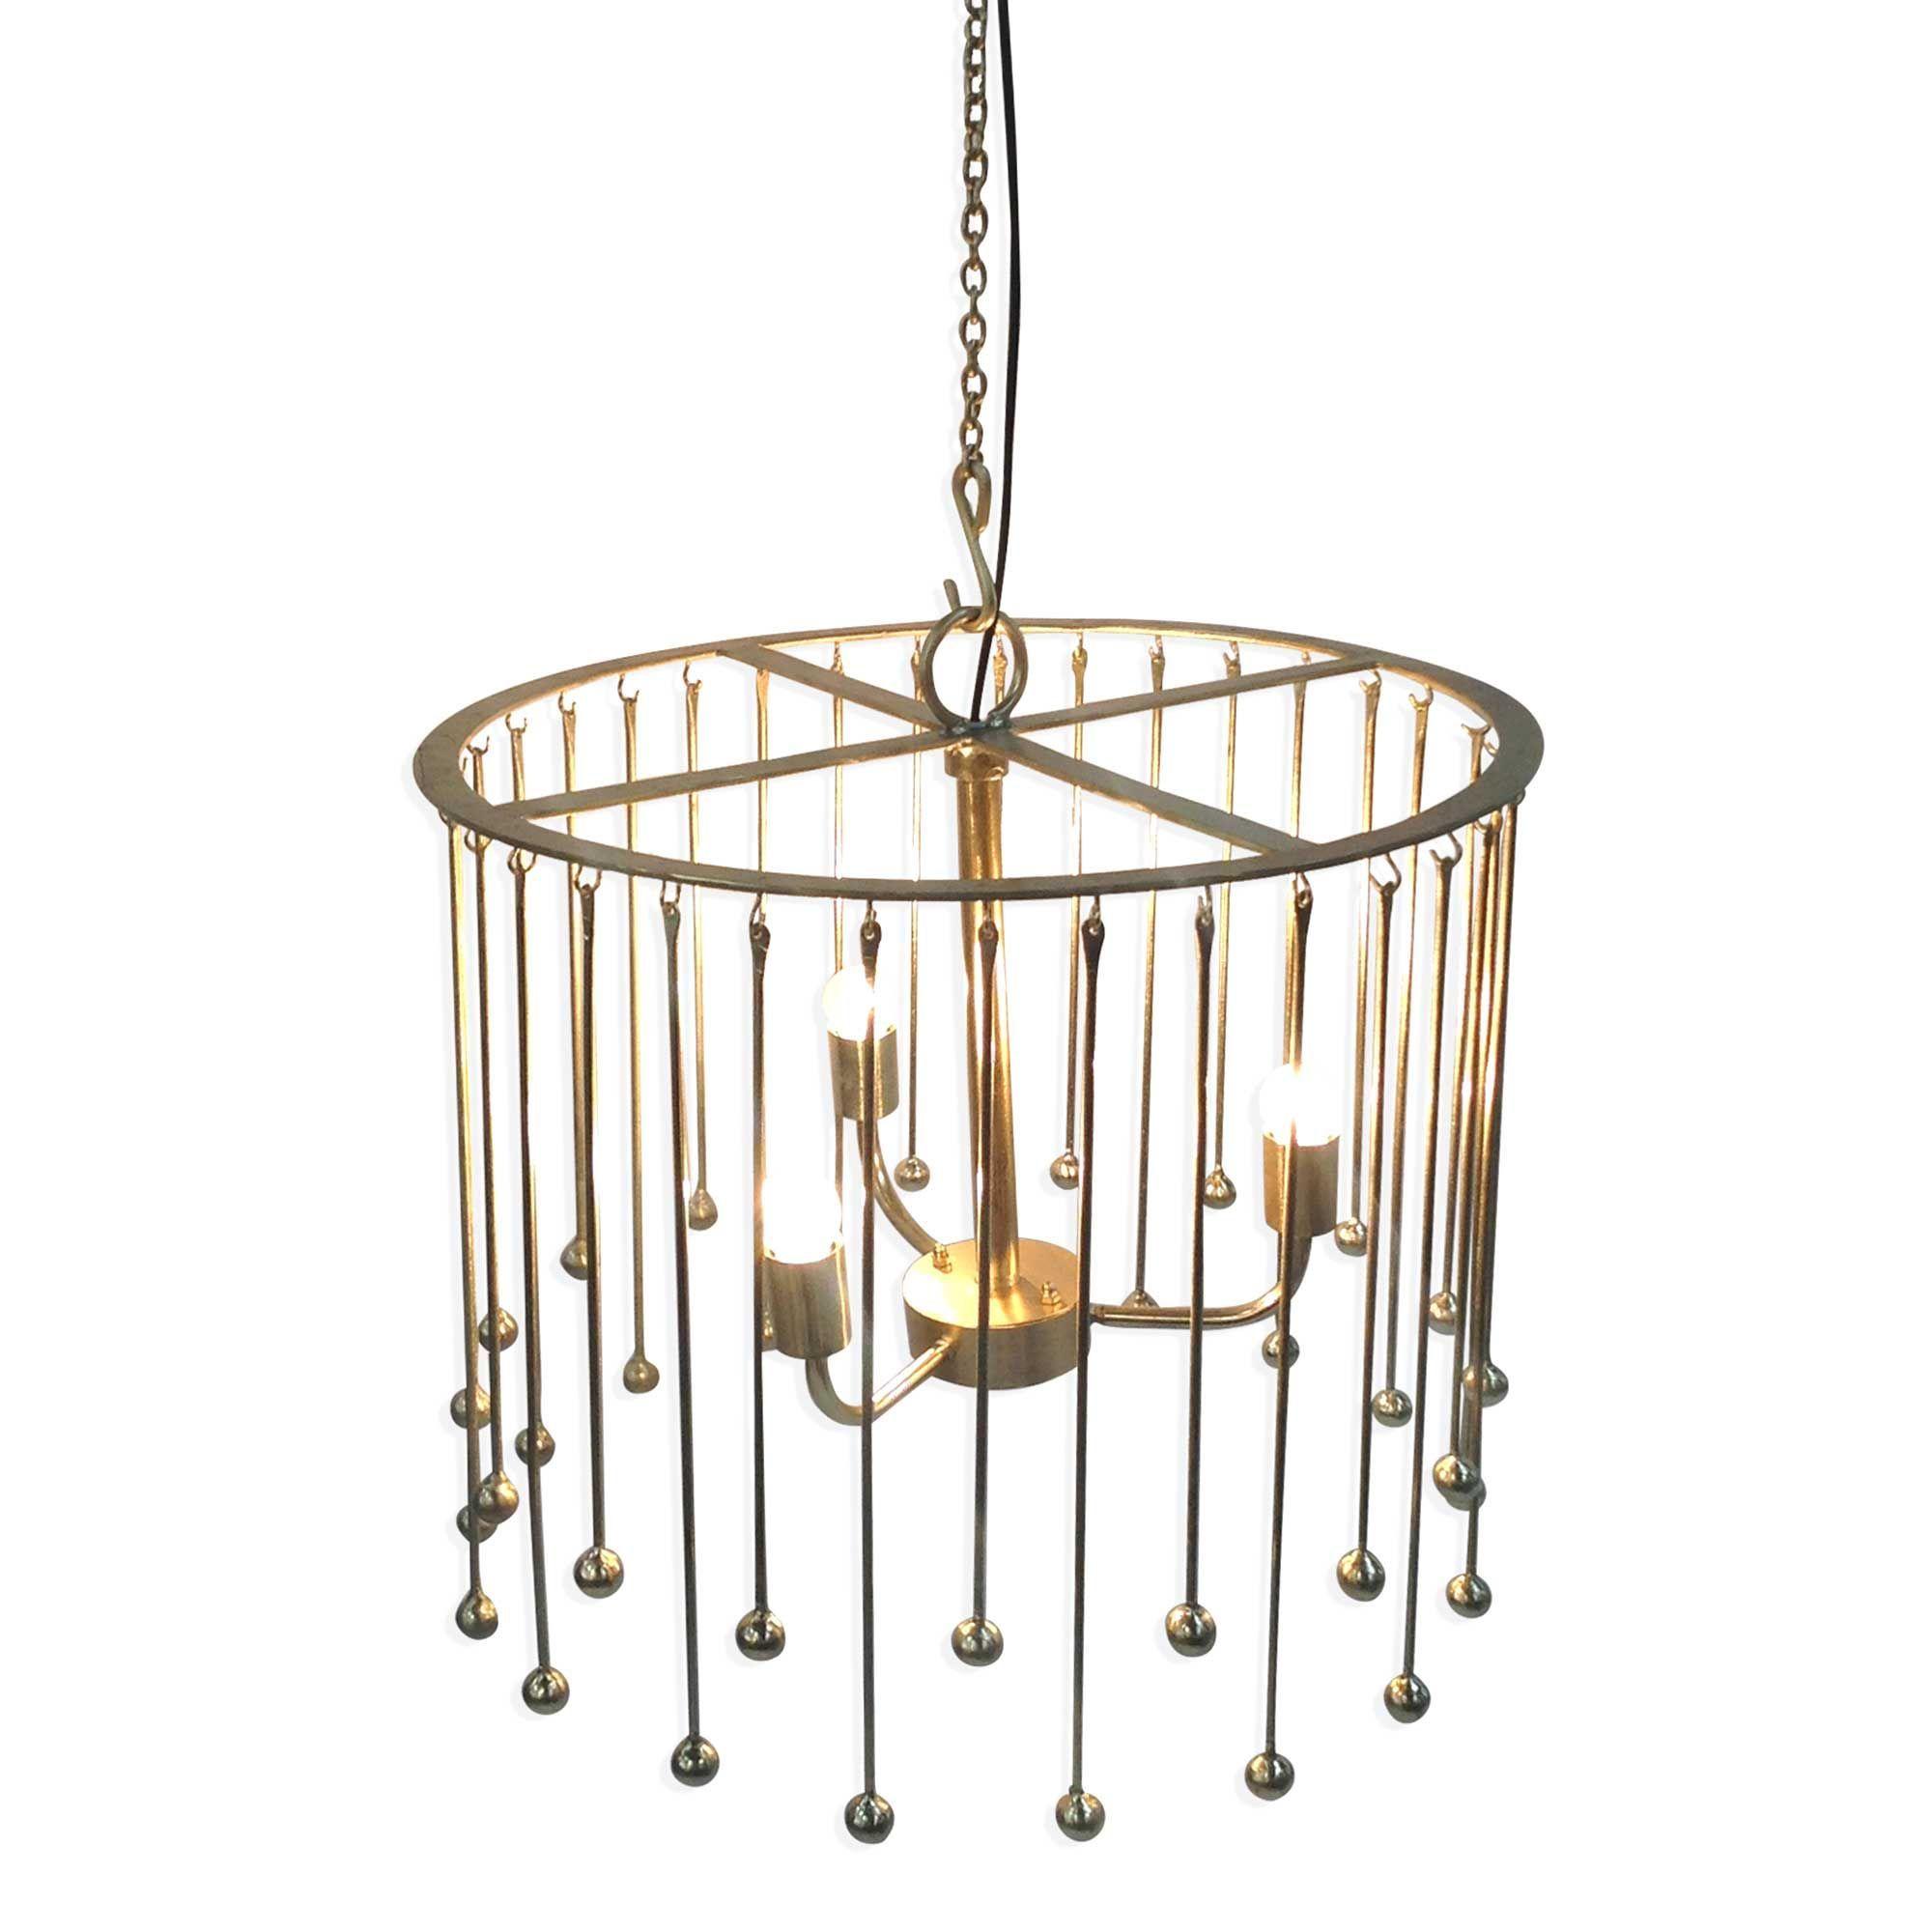 Gold Mood Lighting Helios Chandelier Gold Lighting Accessories Goldmood Lighting Gold Ceiling Light Gold Ceiling Chandelier